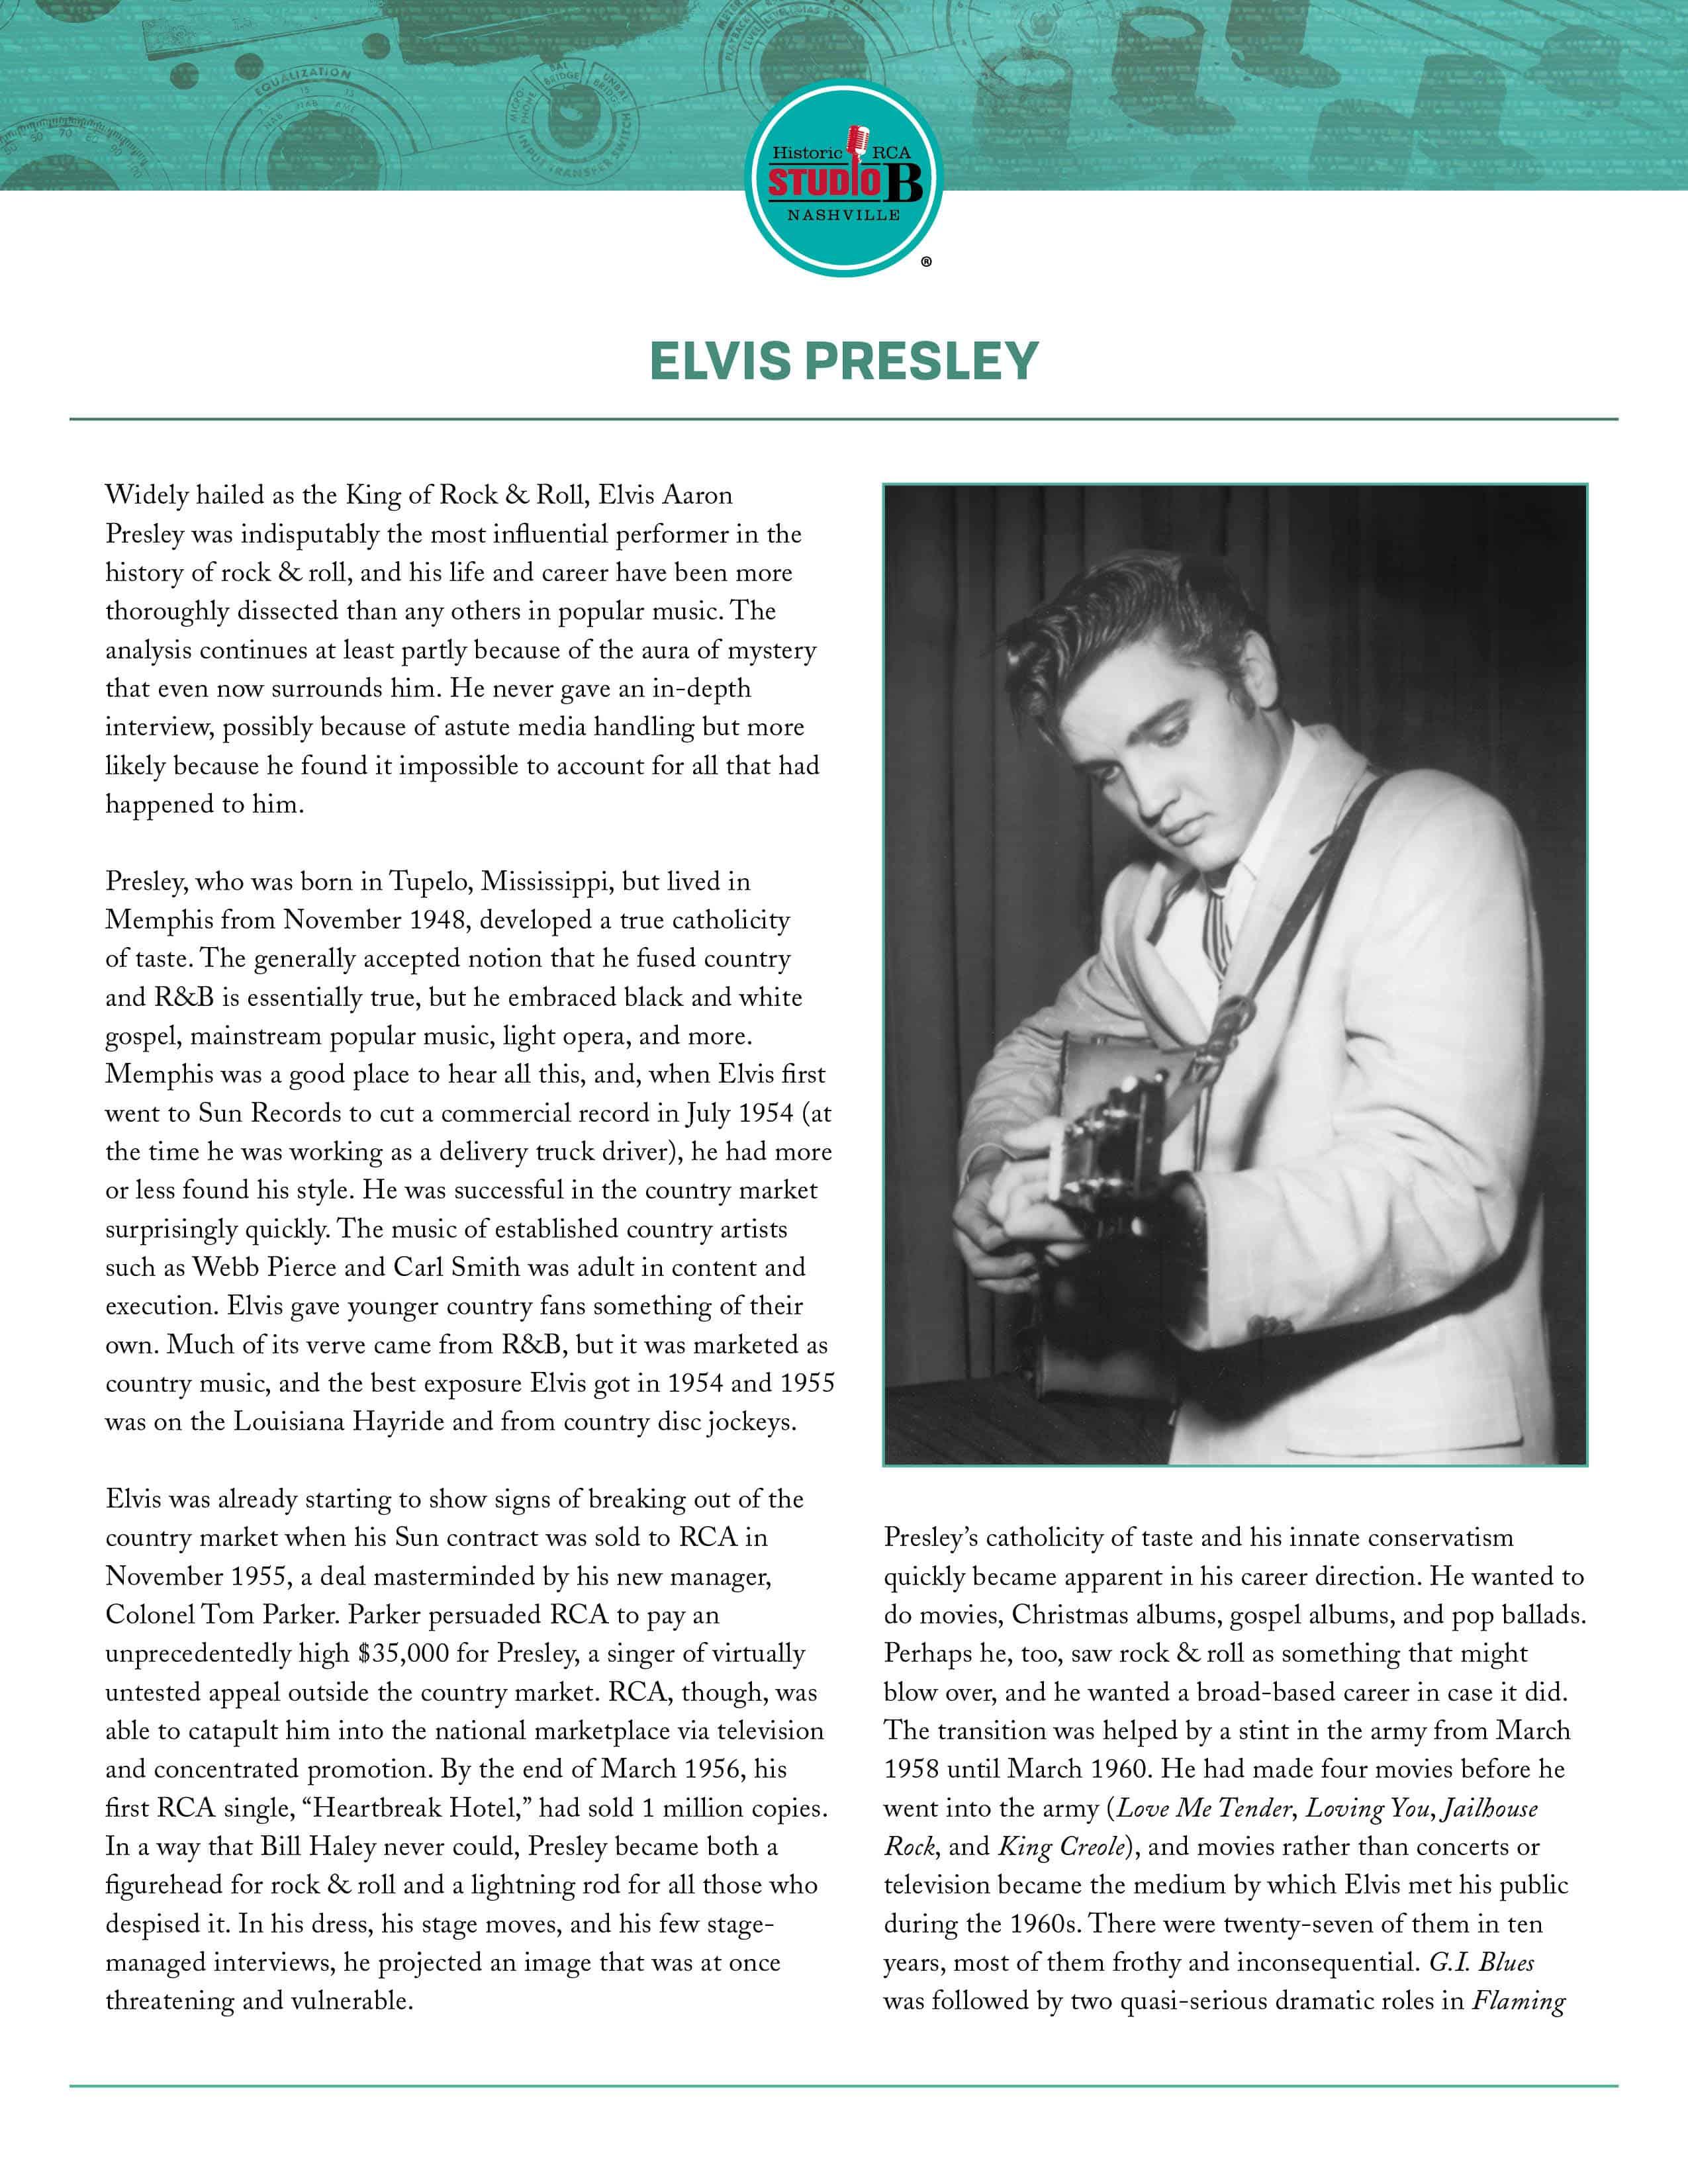 SCH_ElvisPresley_Portal_Lyrics-Bio_18_